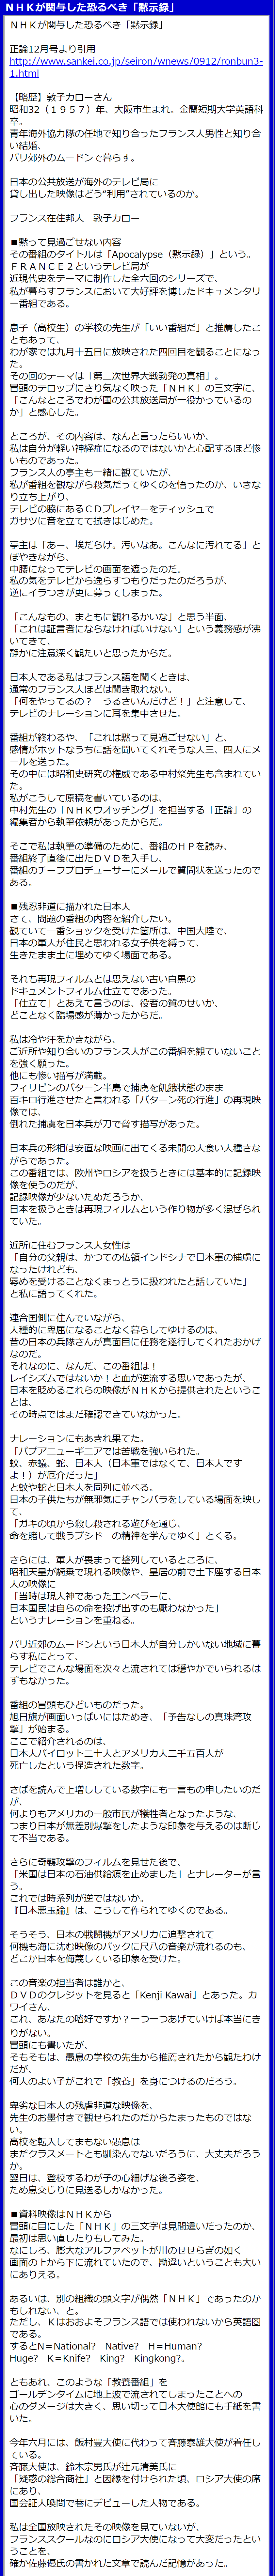 NHKが関与した恐るべき「黙示録」1_1